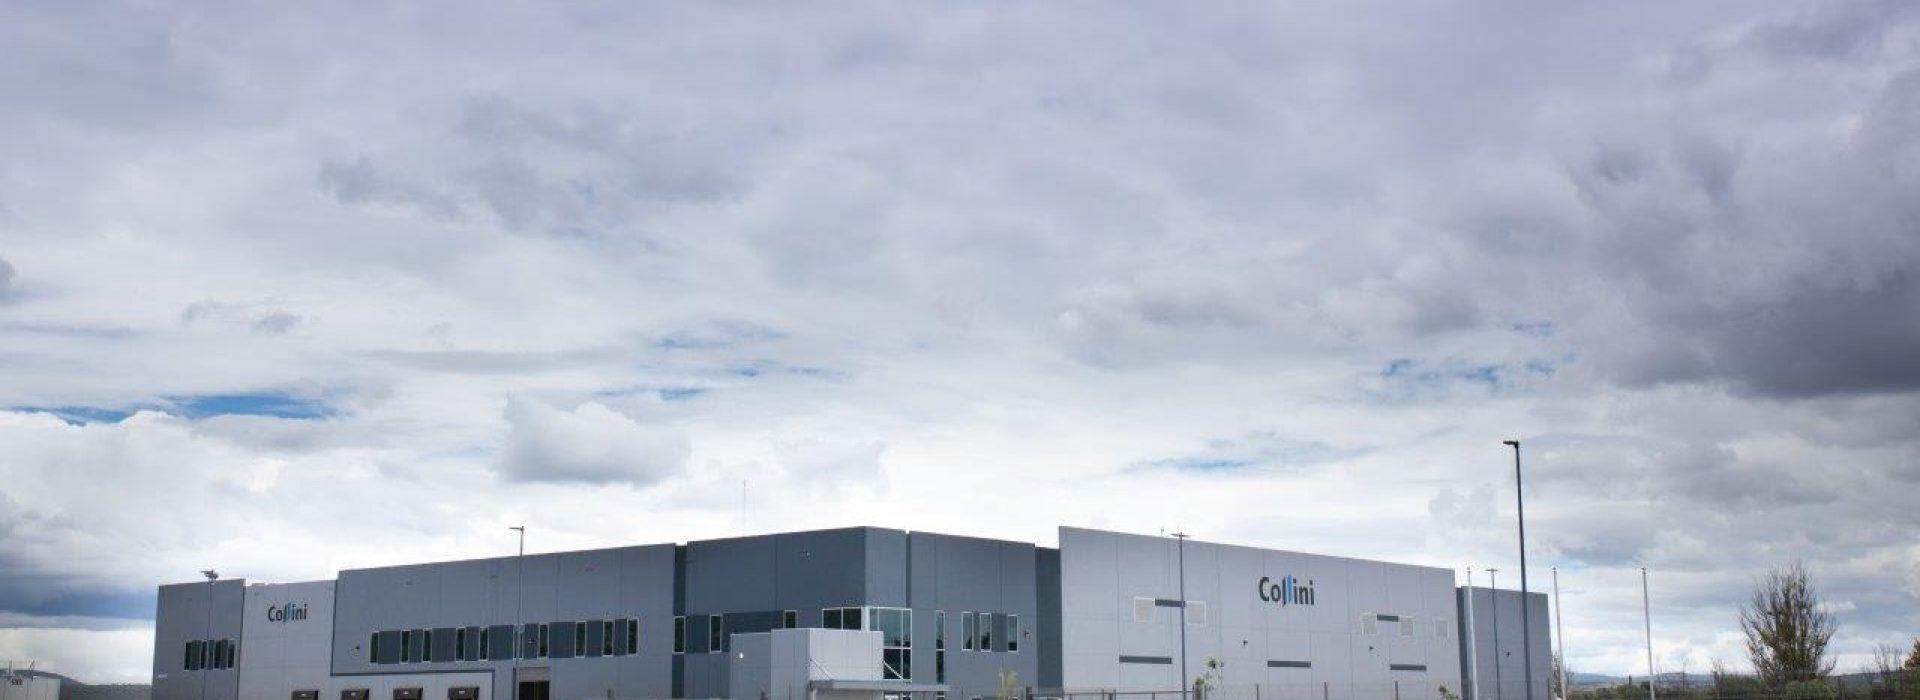 Collini: Weitere Expansion in Nordamerika